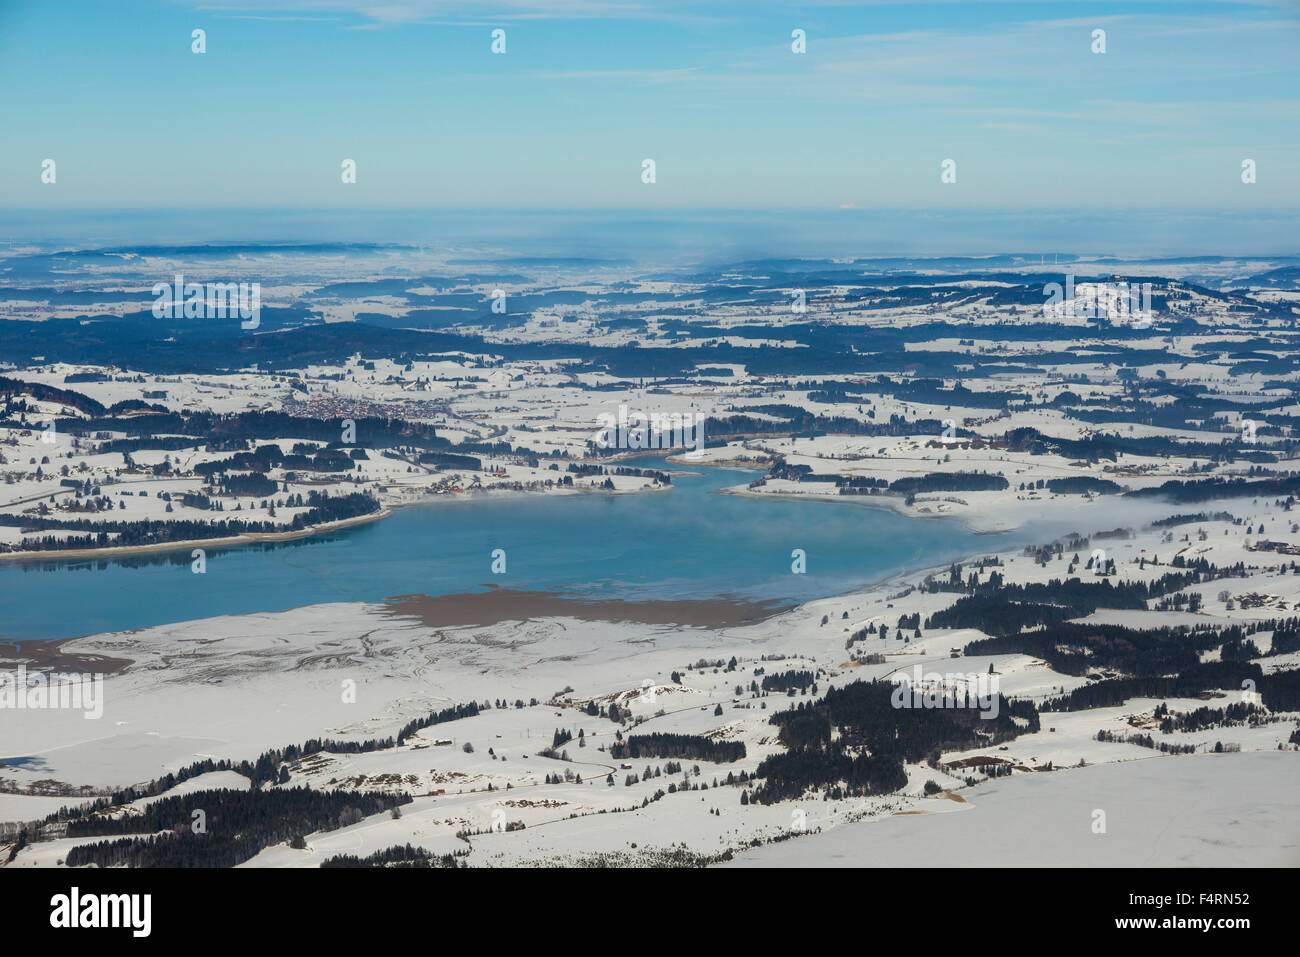 Bavaria, Germany, Europe, Forggensee, fog, Ostallgäu, panorama, Swabian, lake scenery, Tegelberg, winter, scenery, Stock Photo